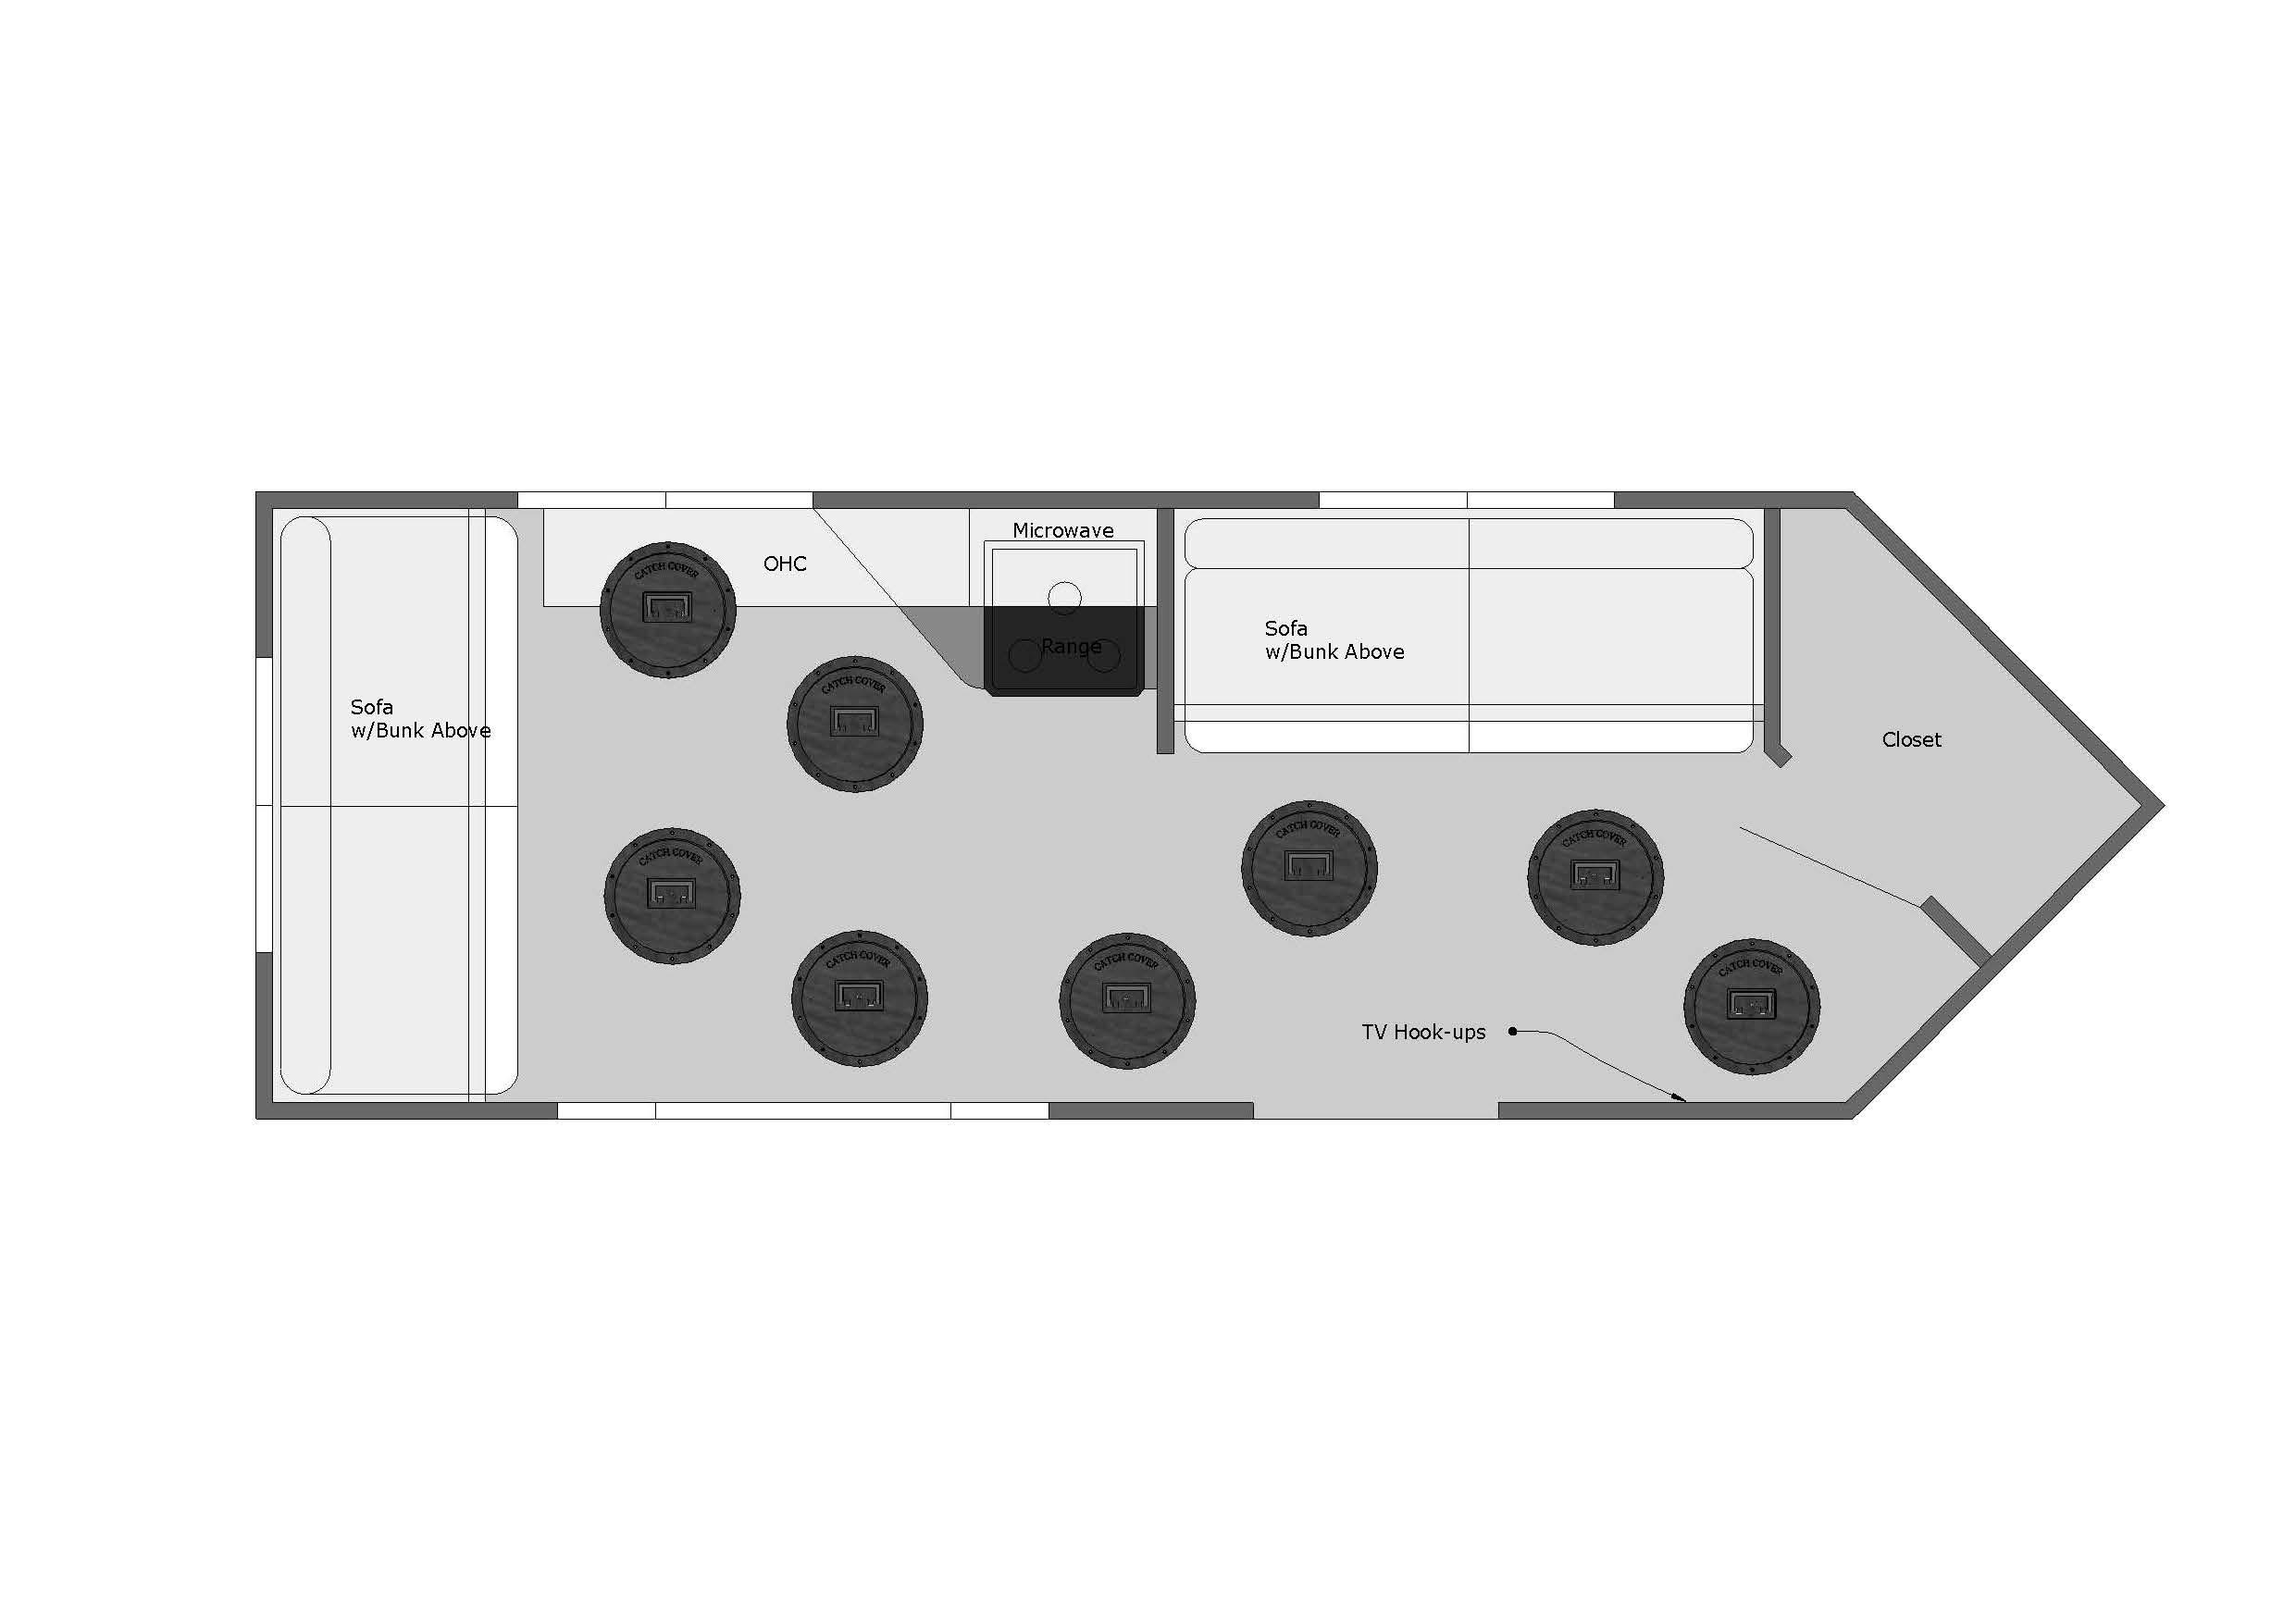 A616-DRK 2018 Angler Edition